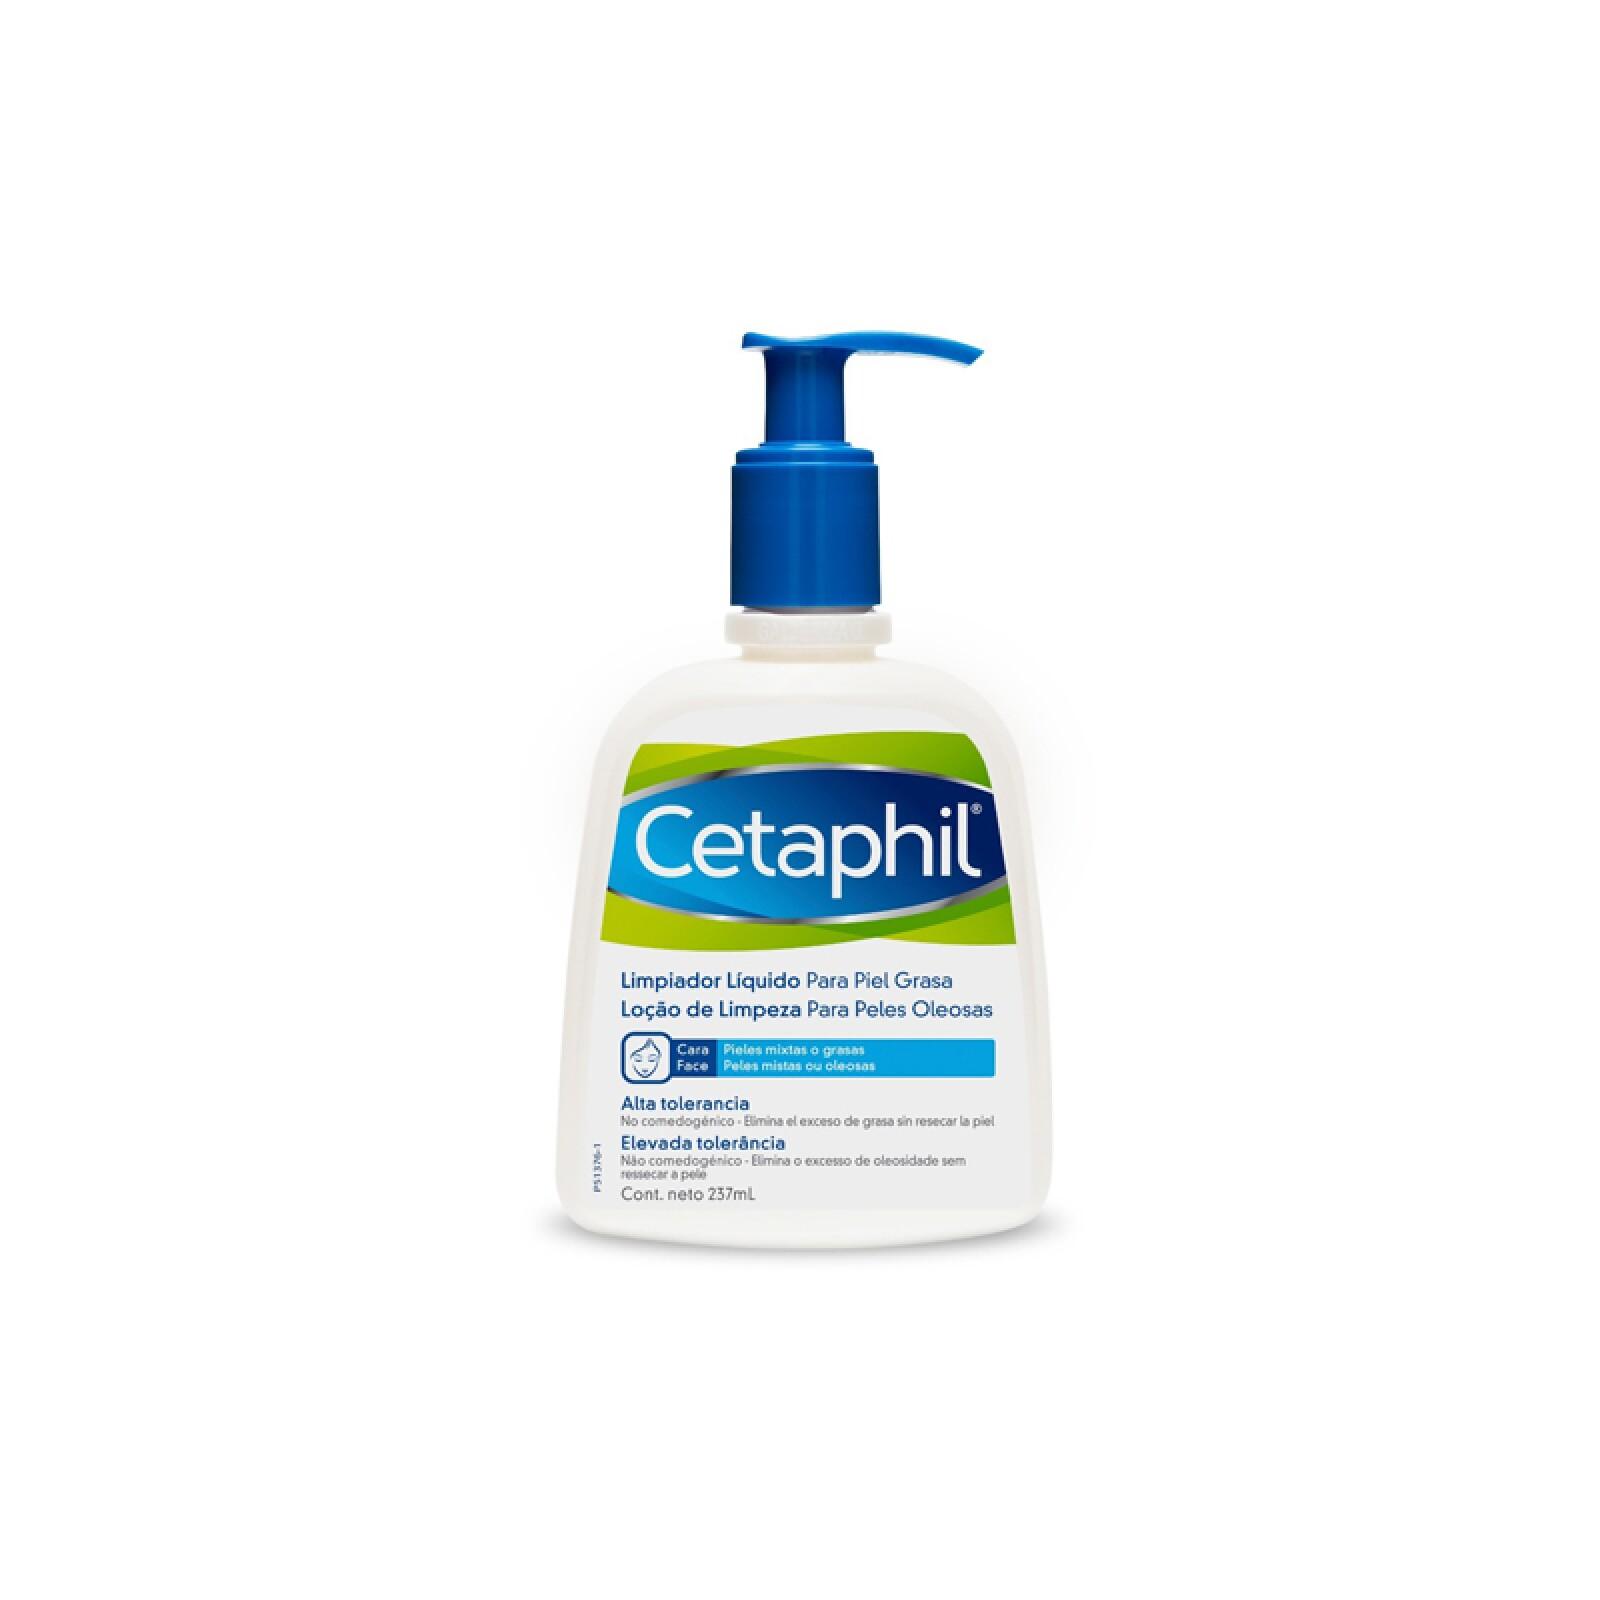 limpiador-cleanser-accesible-barato-skincare-limpieza-cetaphil